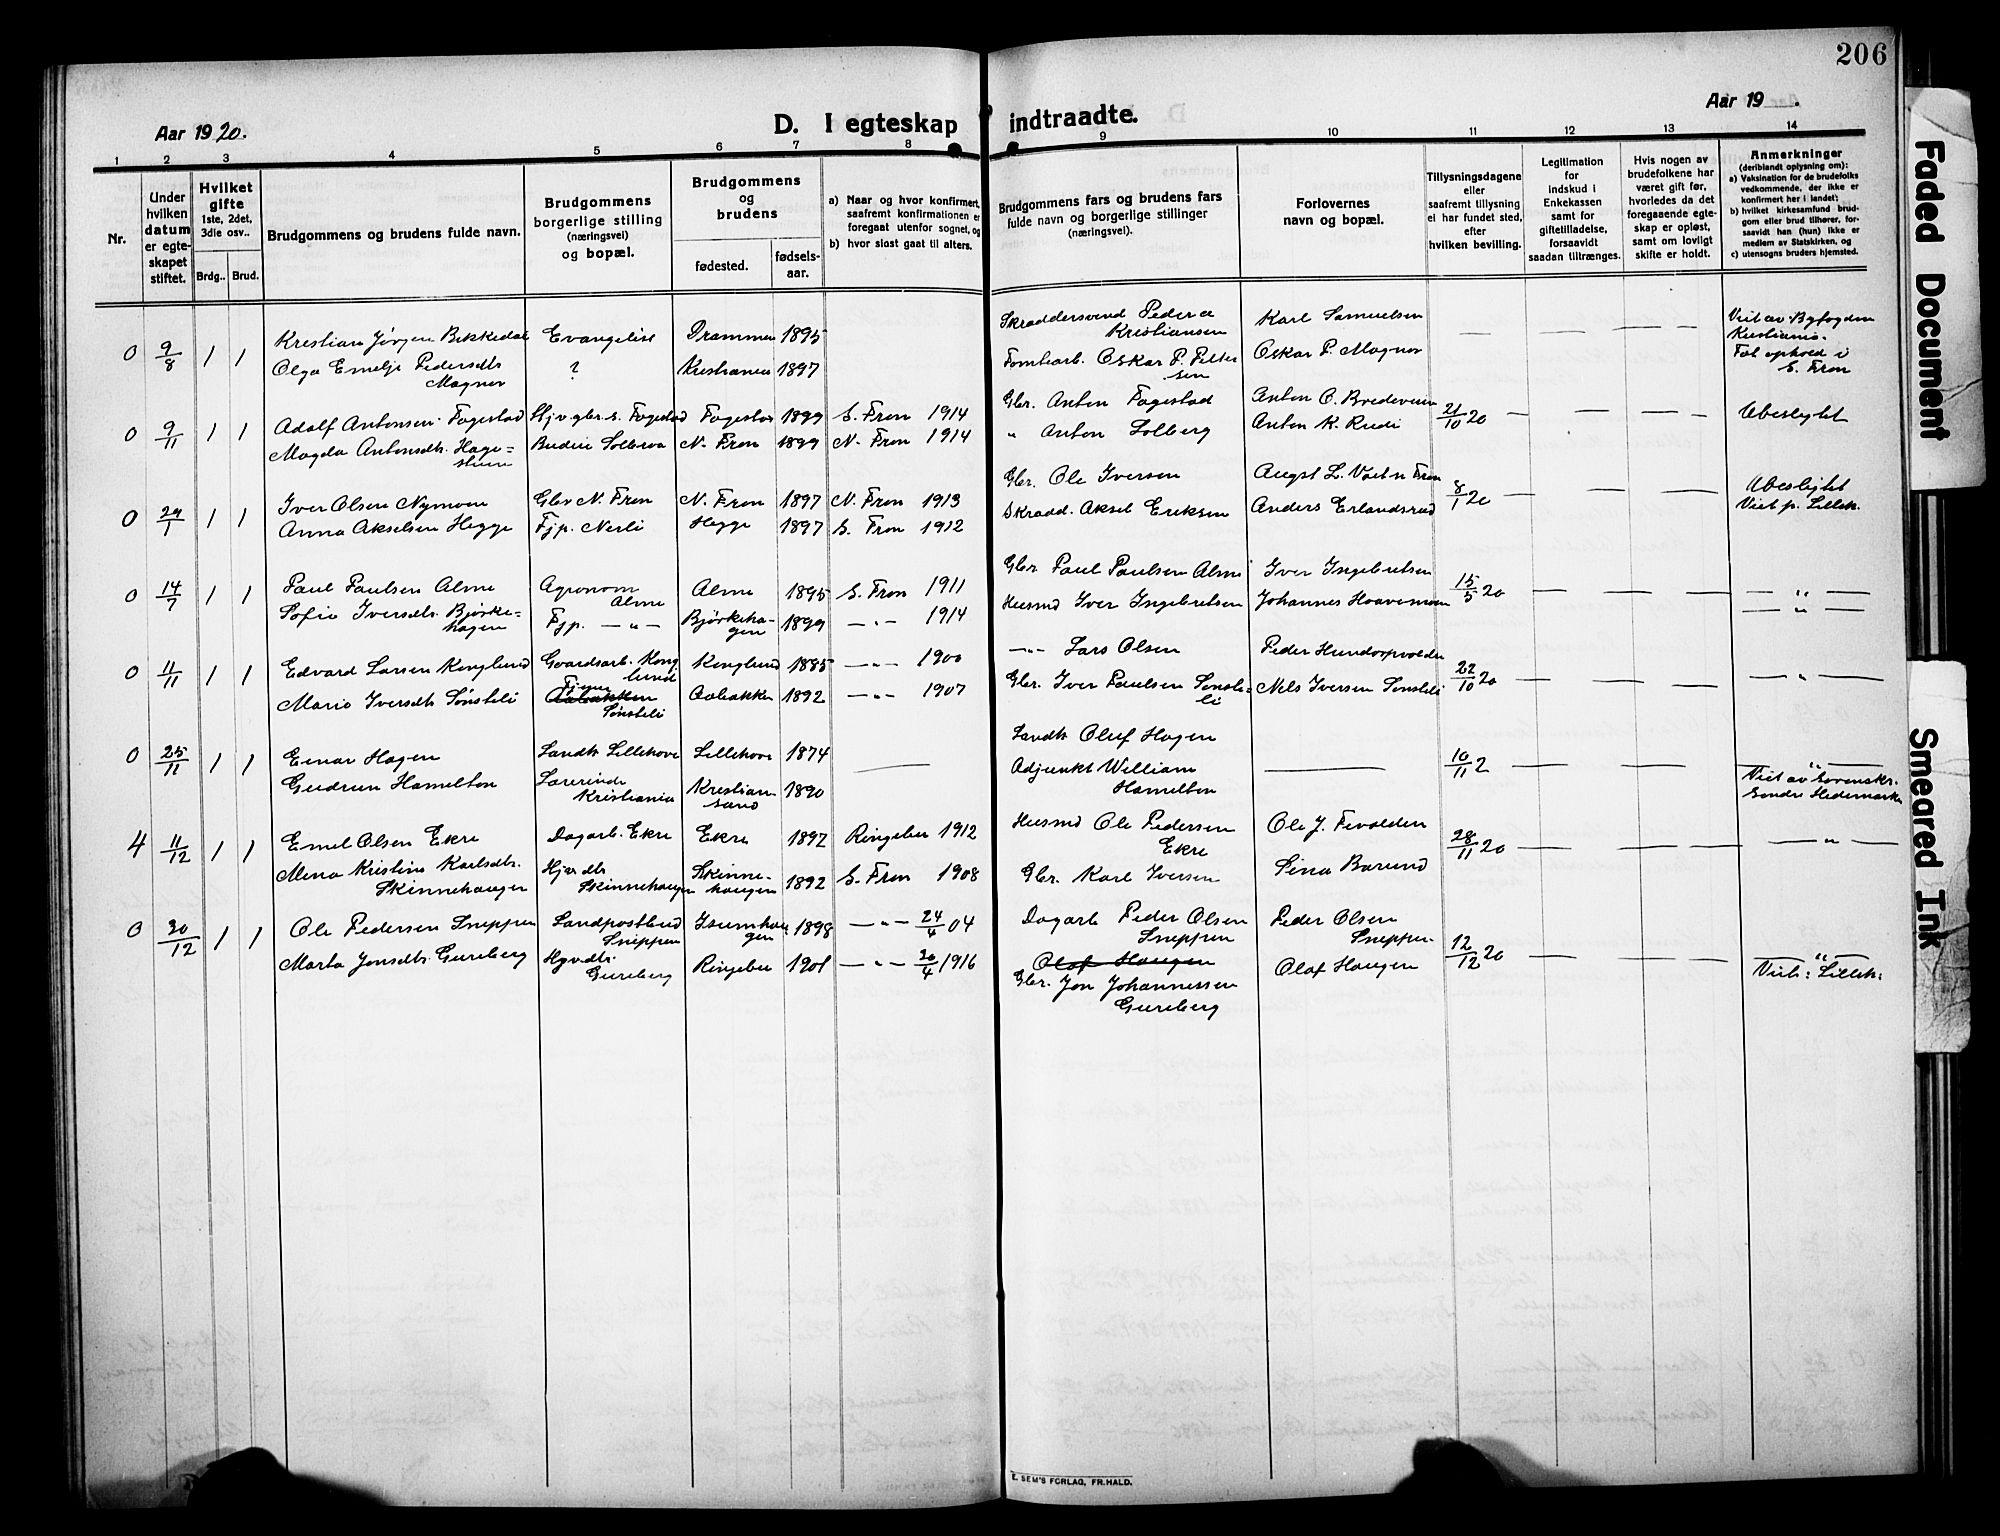 SAH, Sør-Fron prestekontor, H/Ha/Hab/L0005: Klokkerbok nr. 5, 1912-1930, s. 206